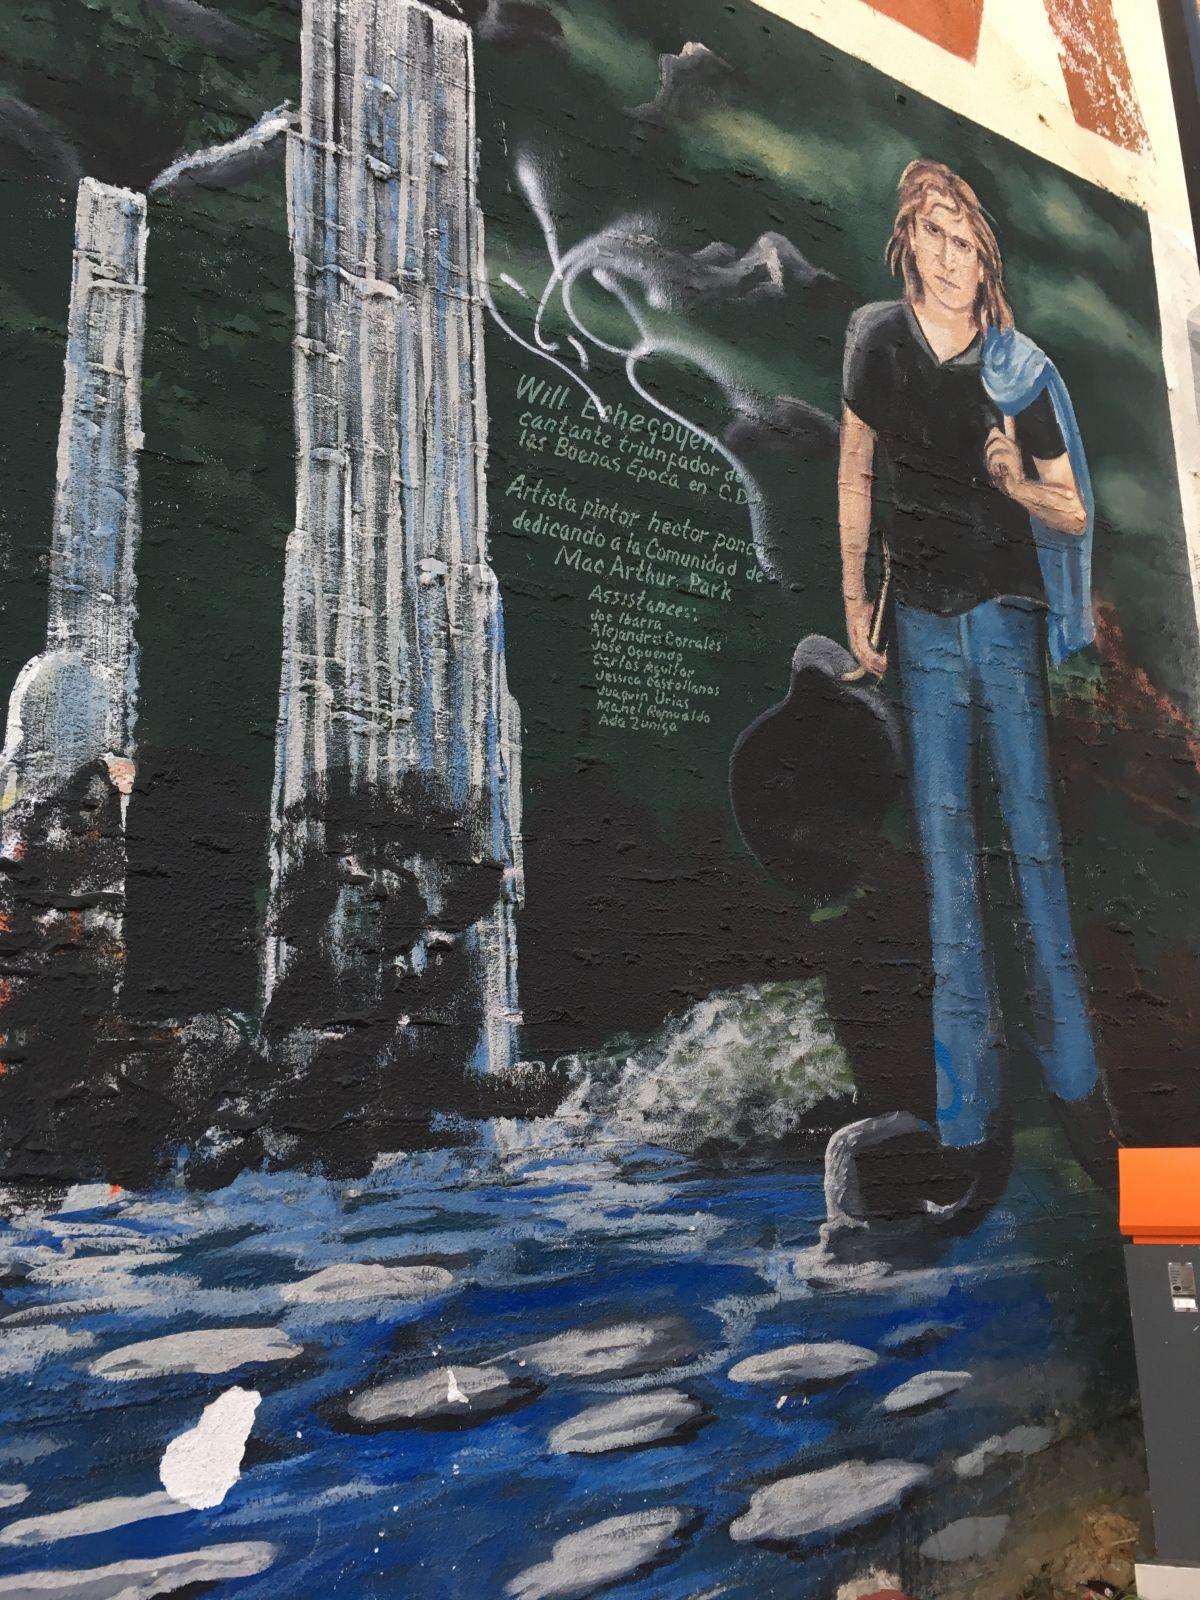 street art in Westlake